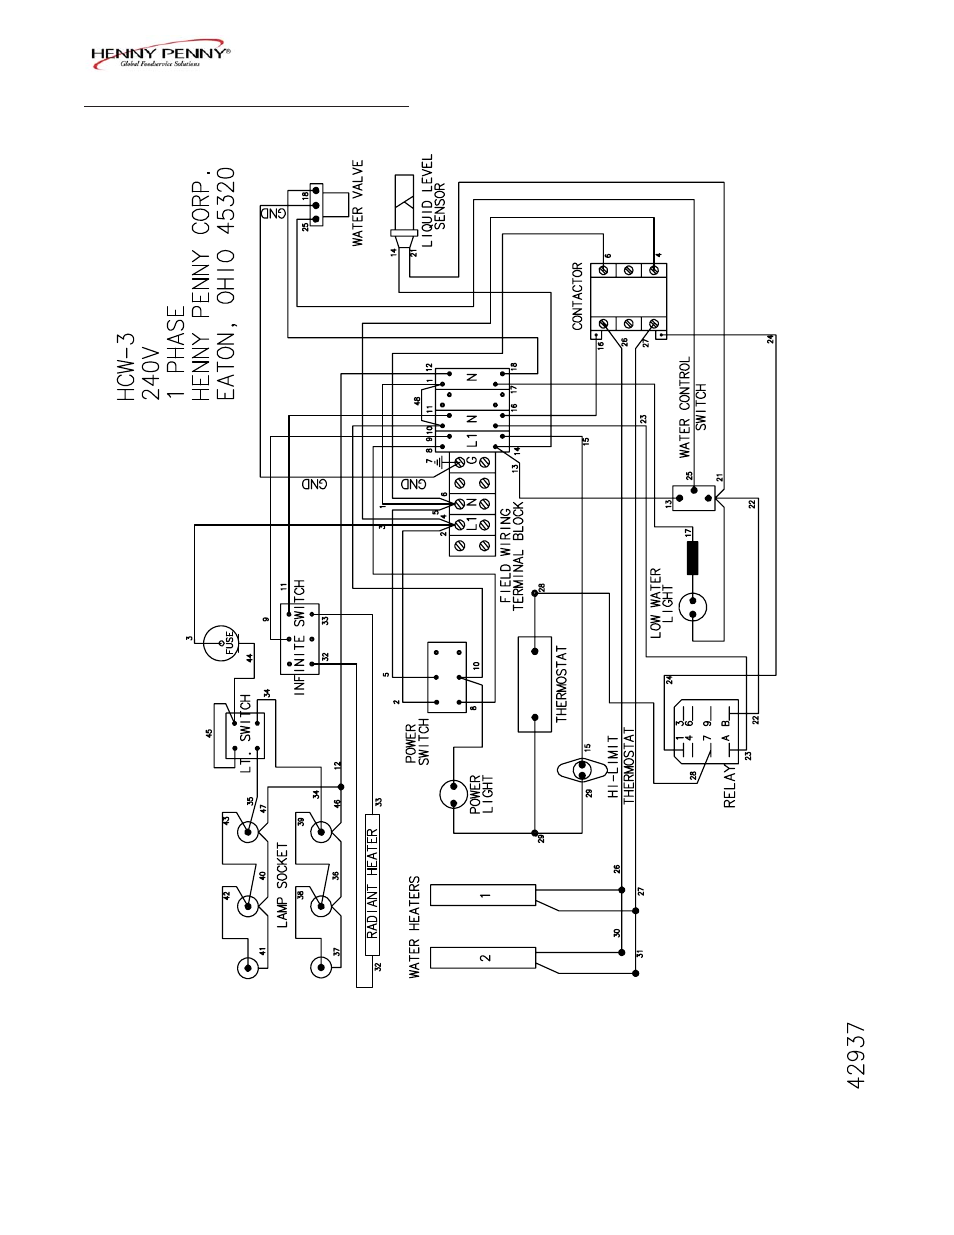 henny penny wiring diagram powermate portable generator